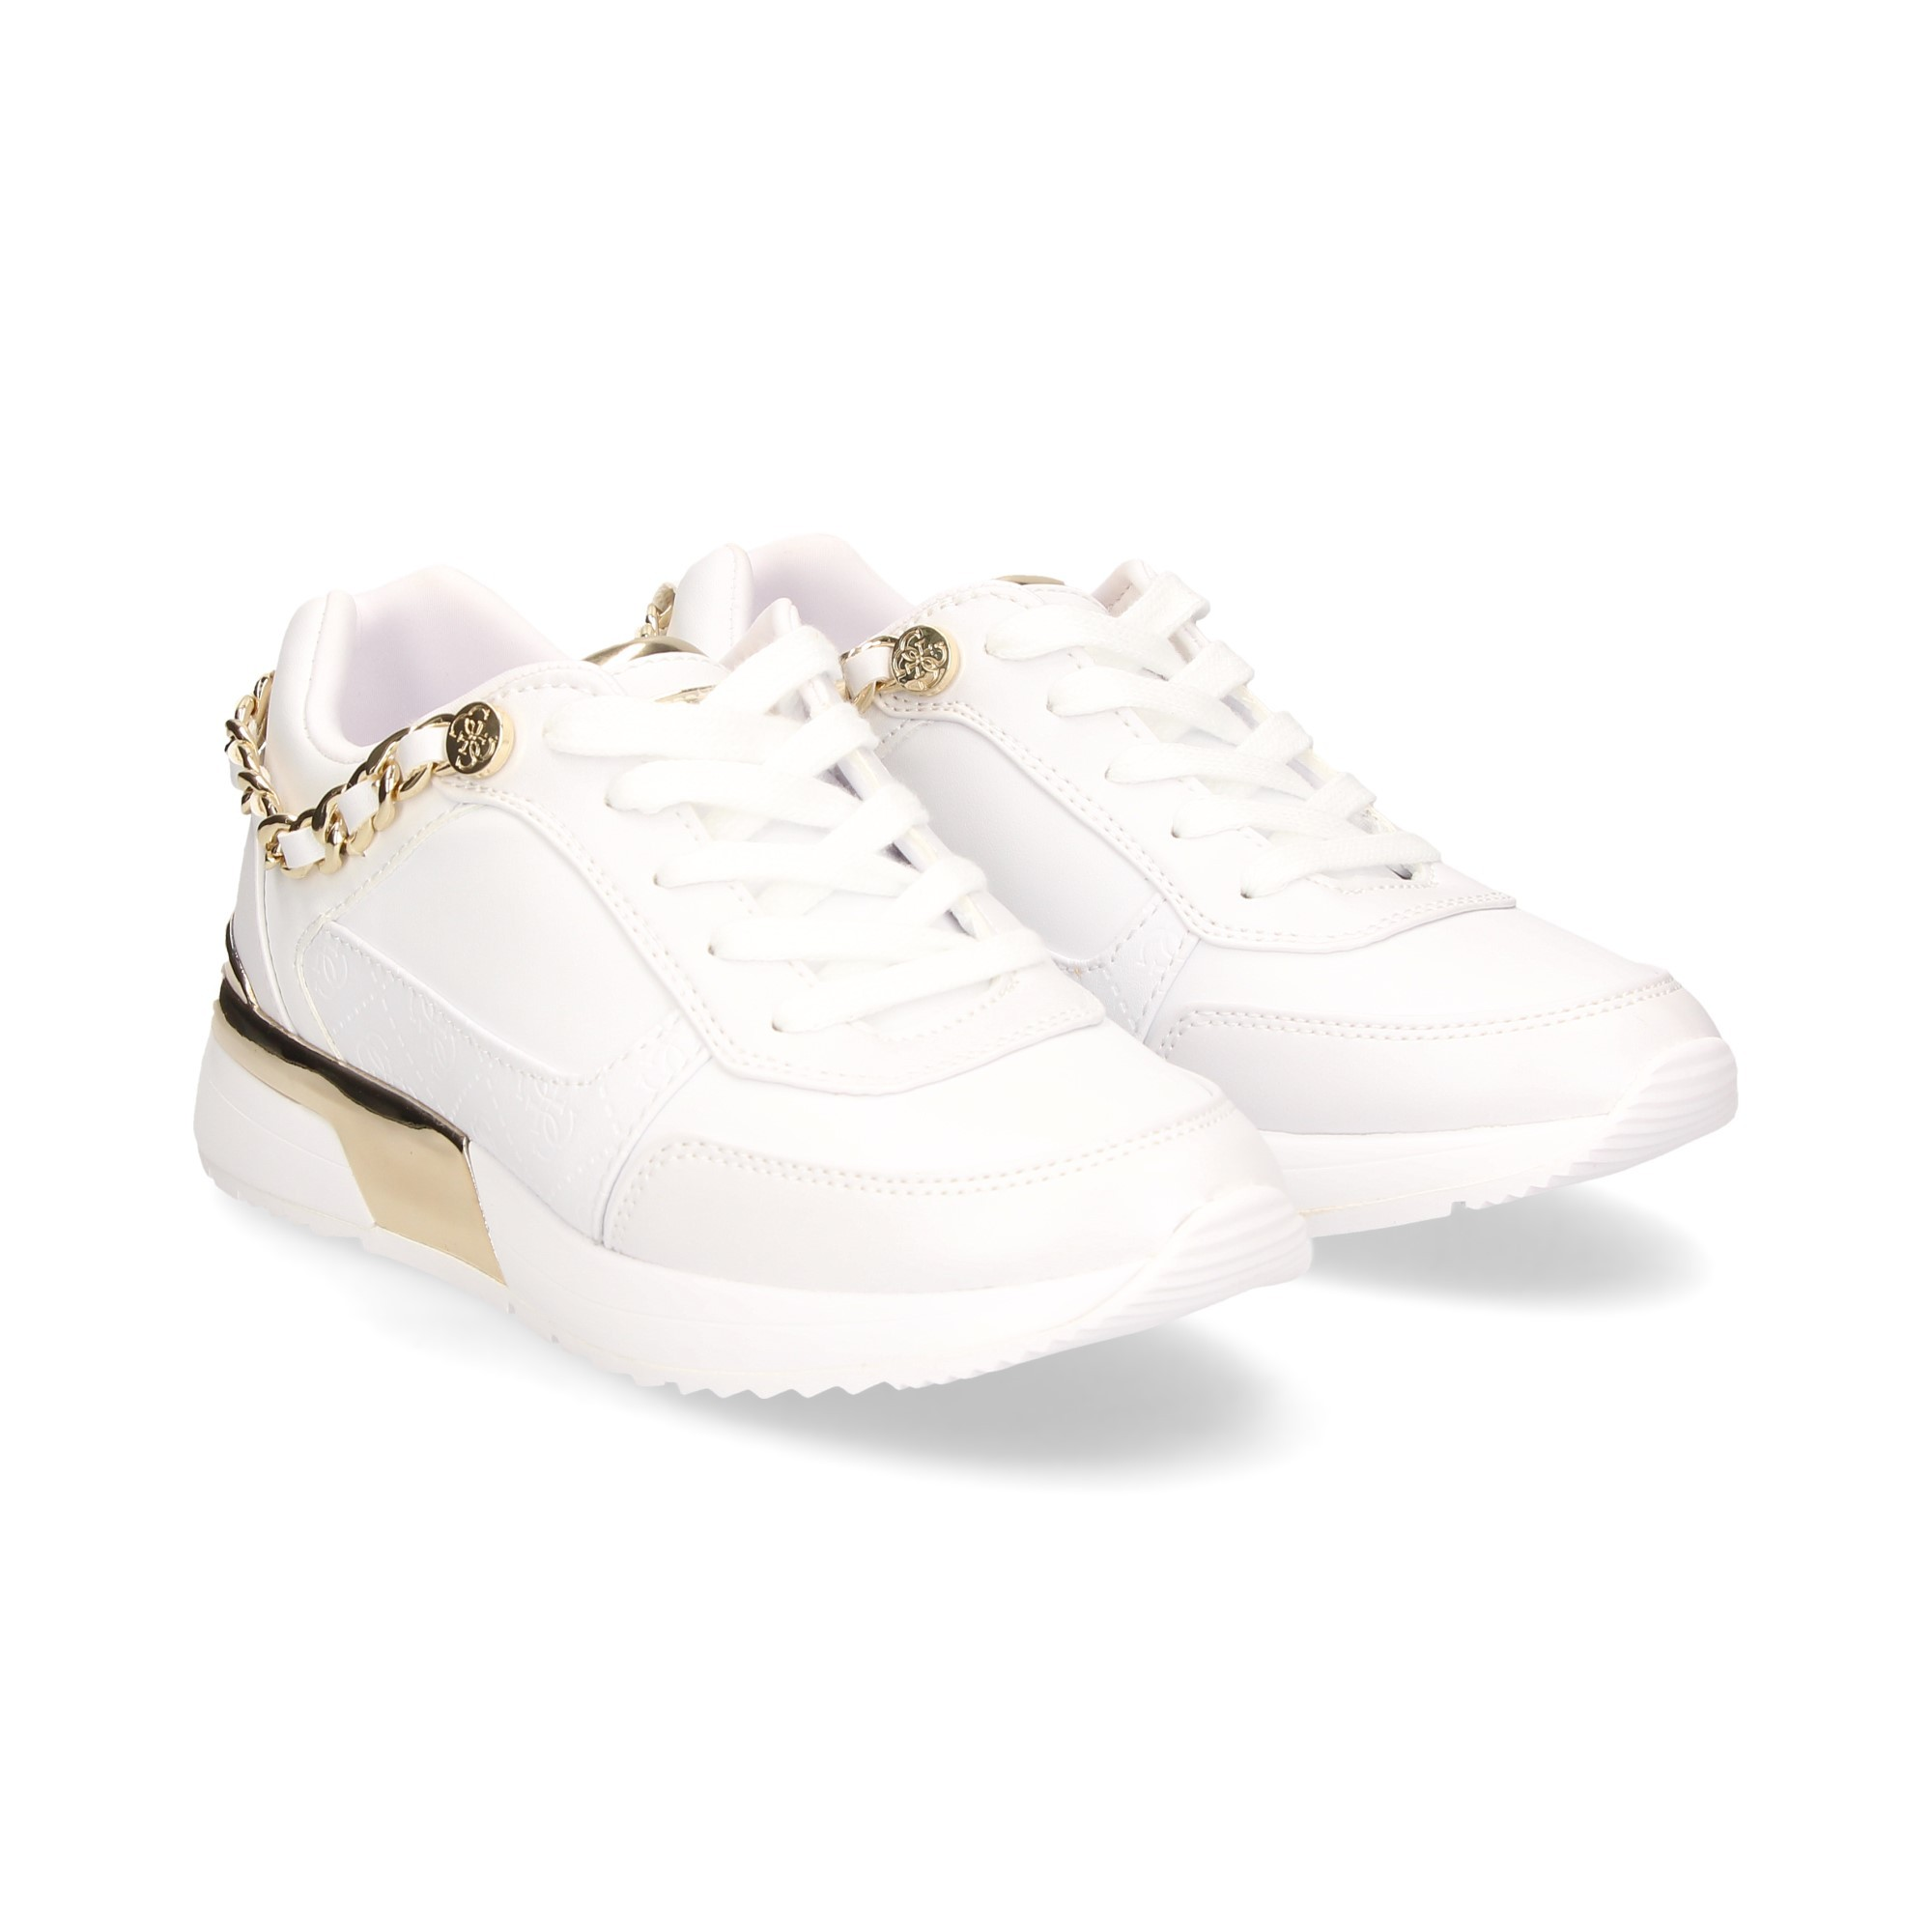 GUESS Women's Sneakers FL7MI2 ELE12 WHITE